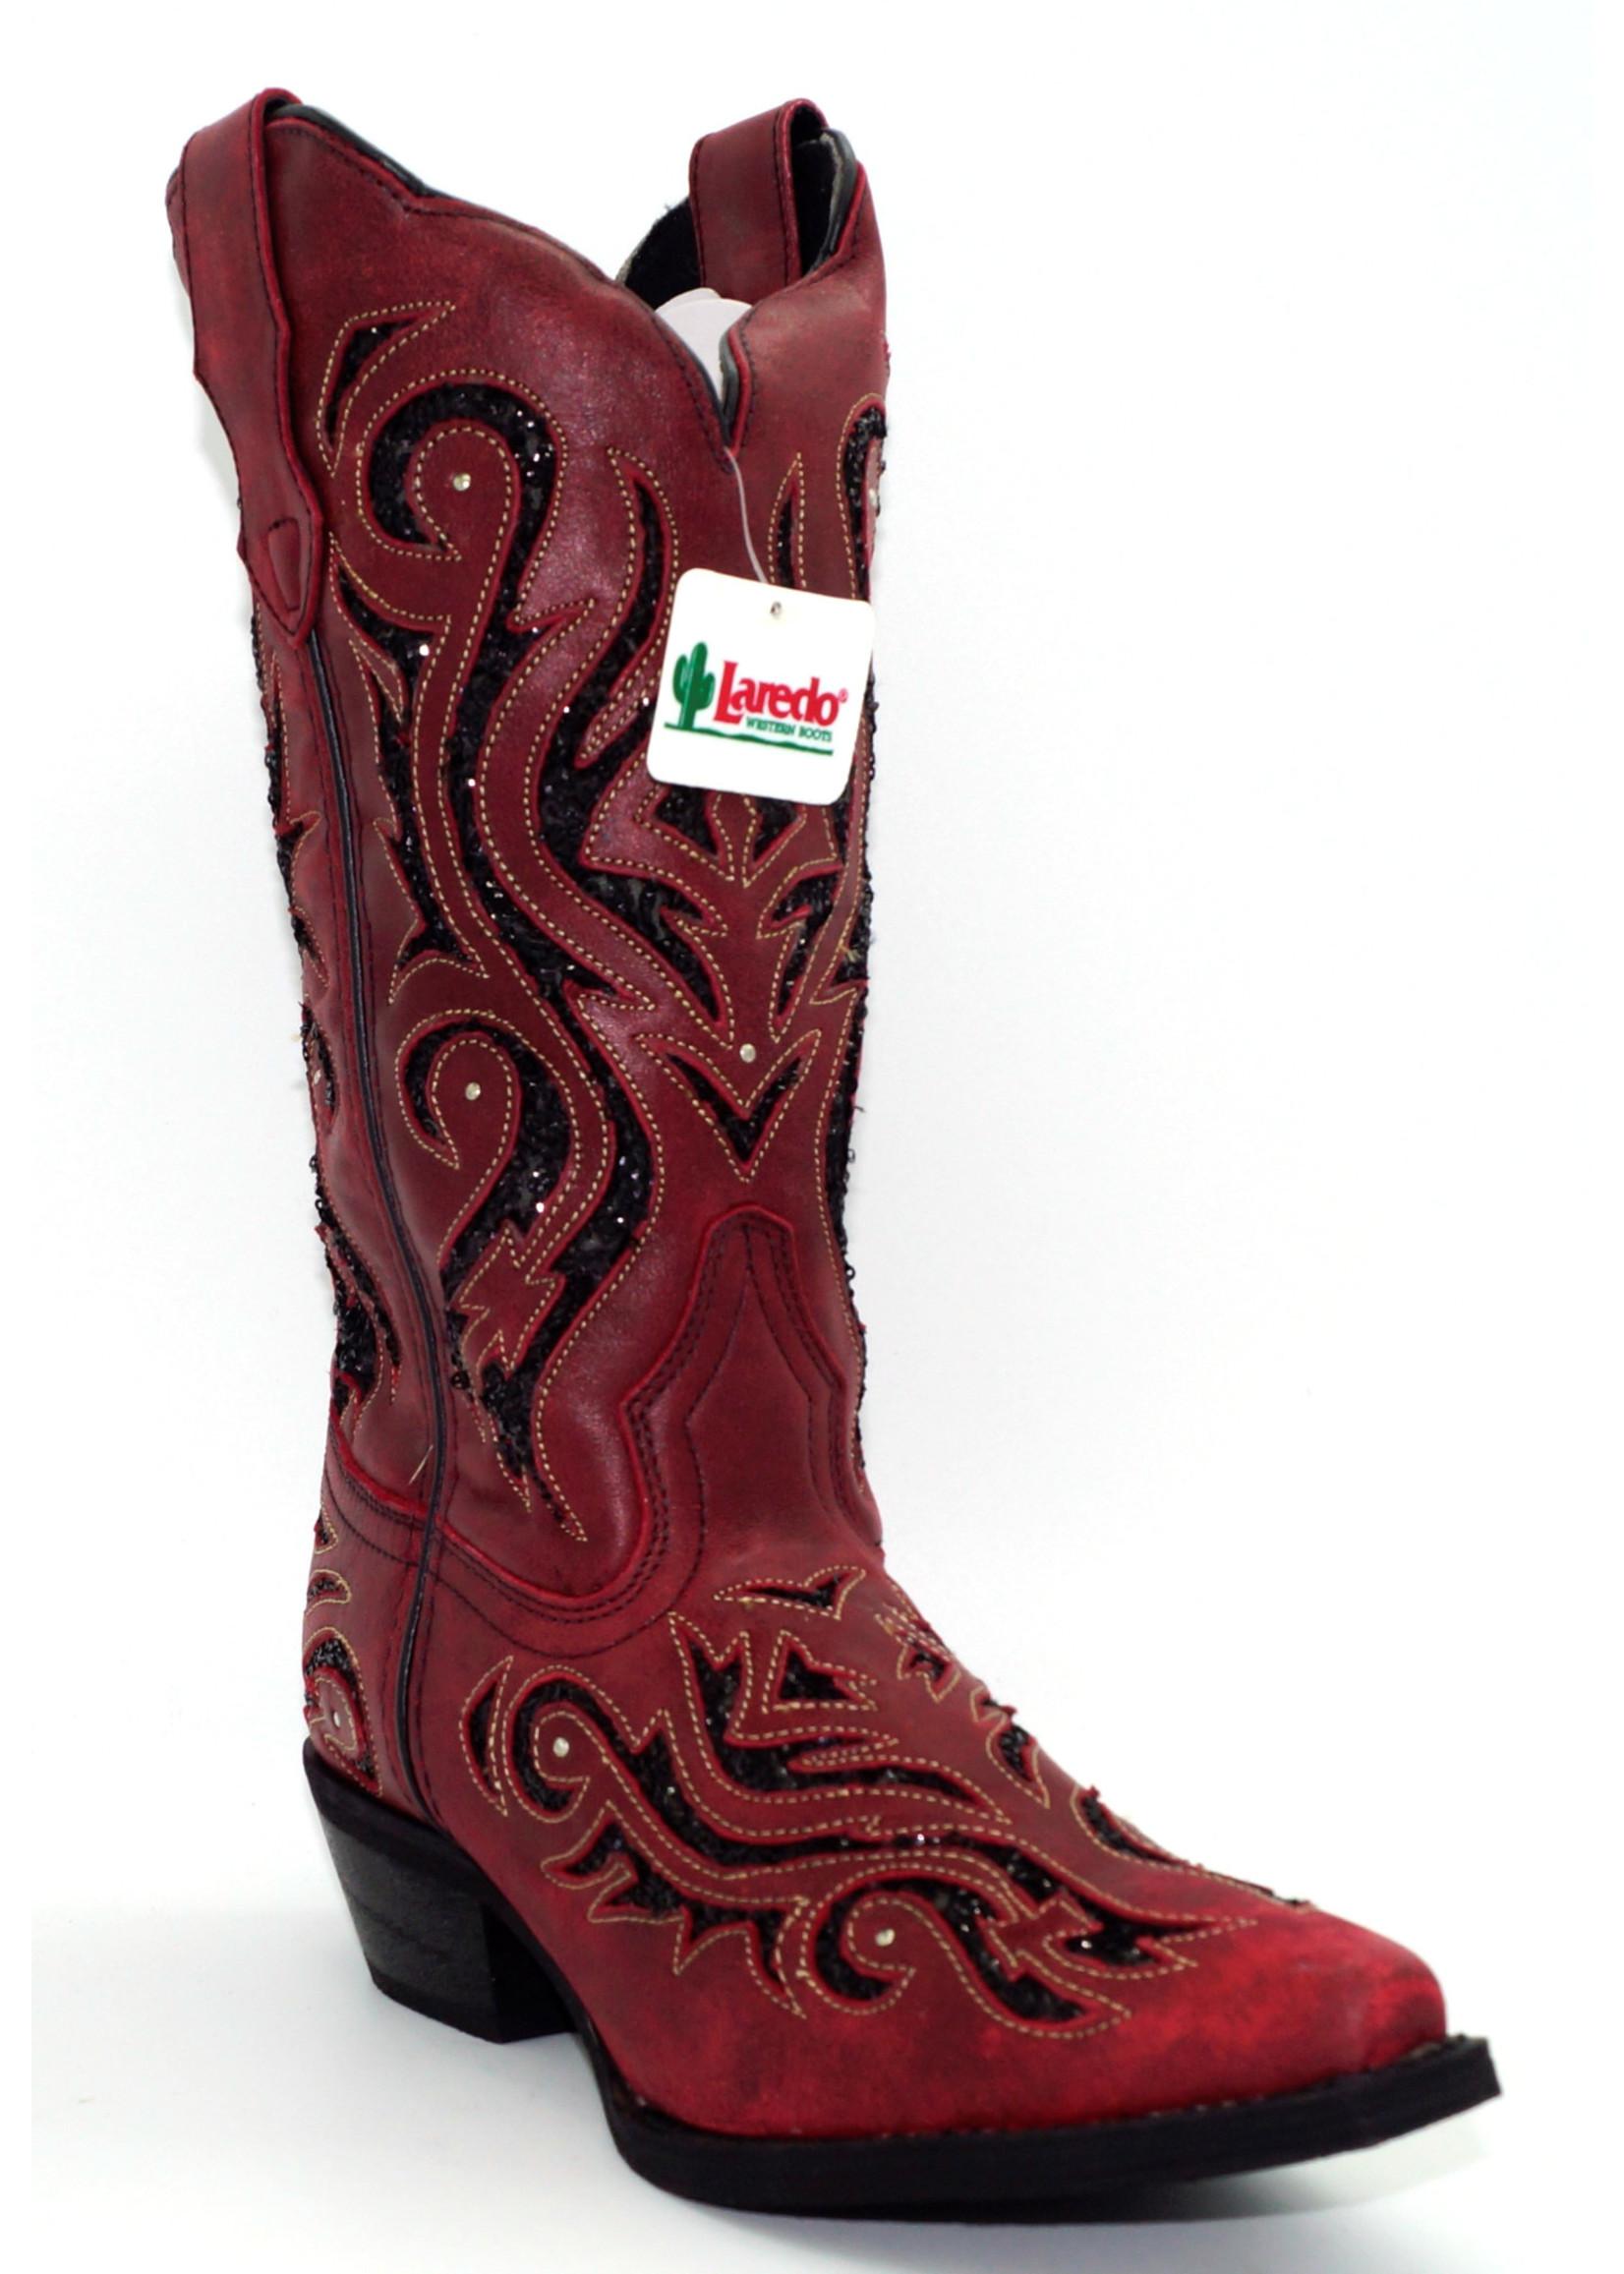 Laredo WOMEN'S WILD THANG LEATHER BOOT 52195